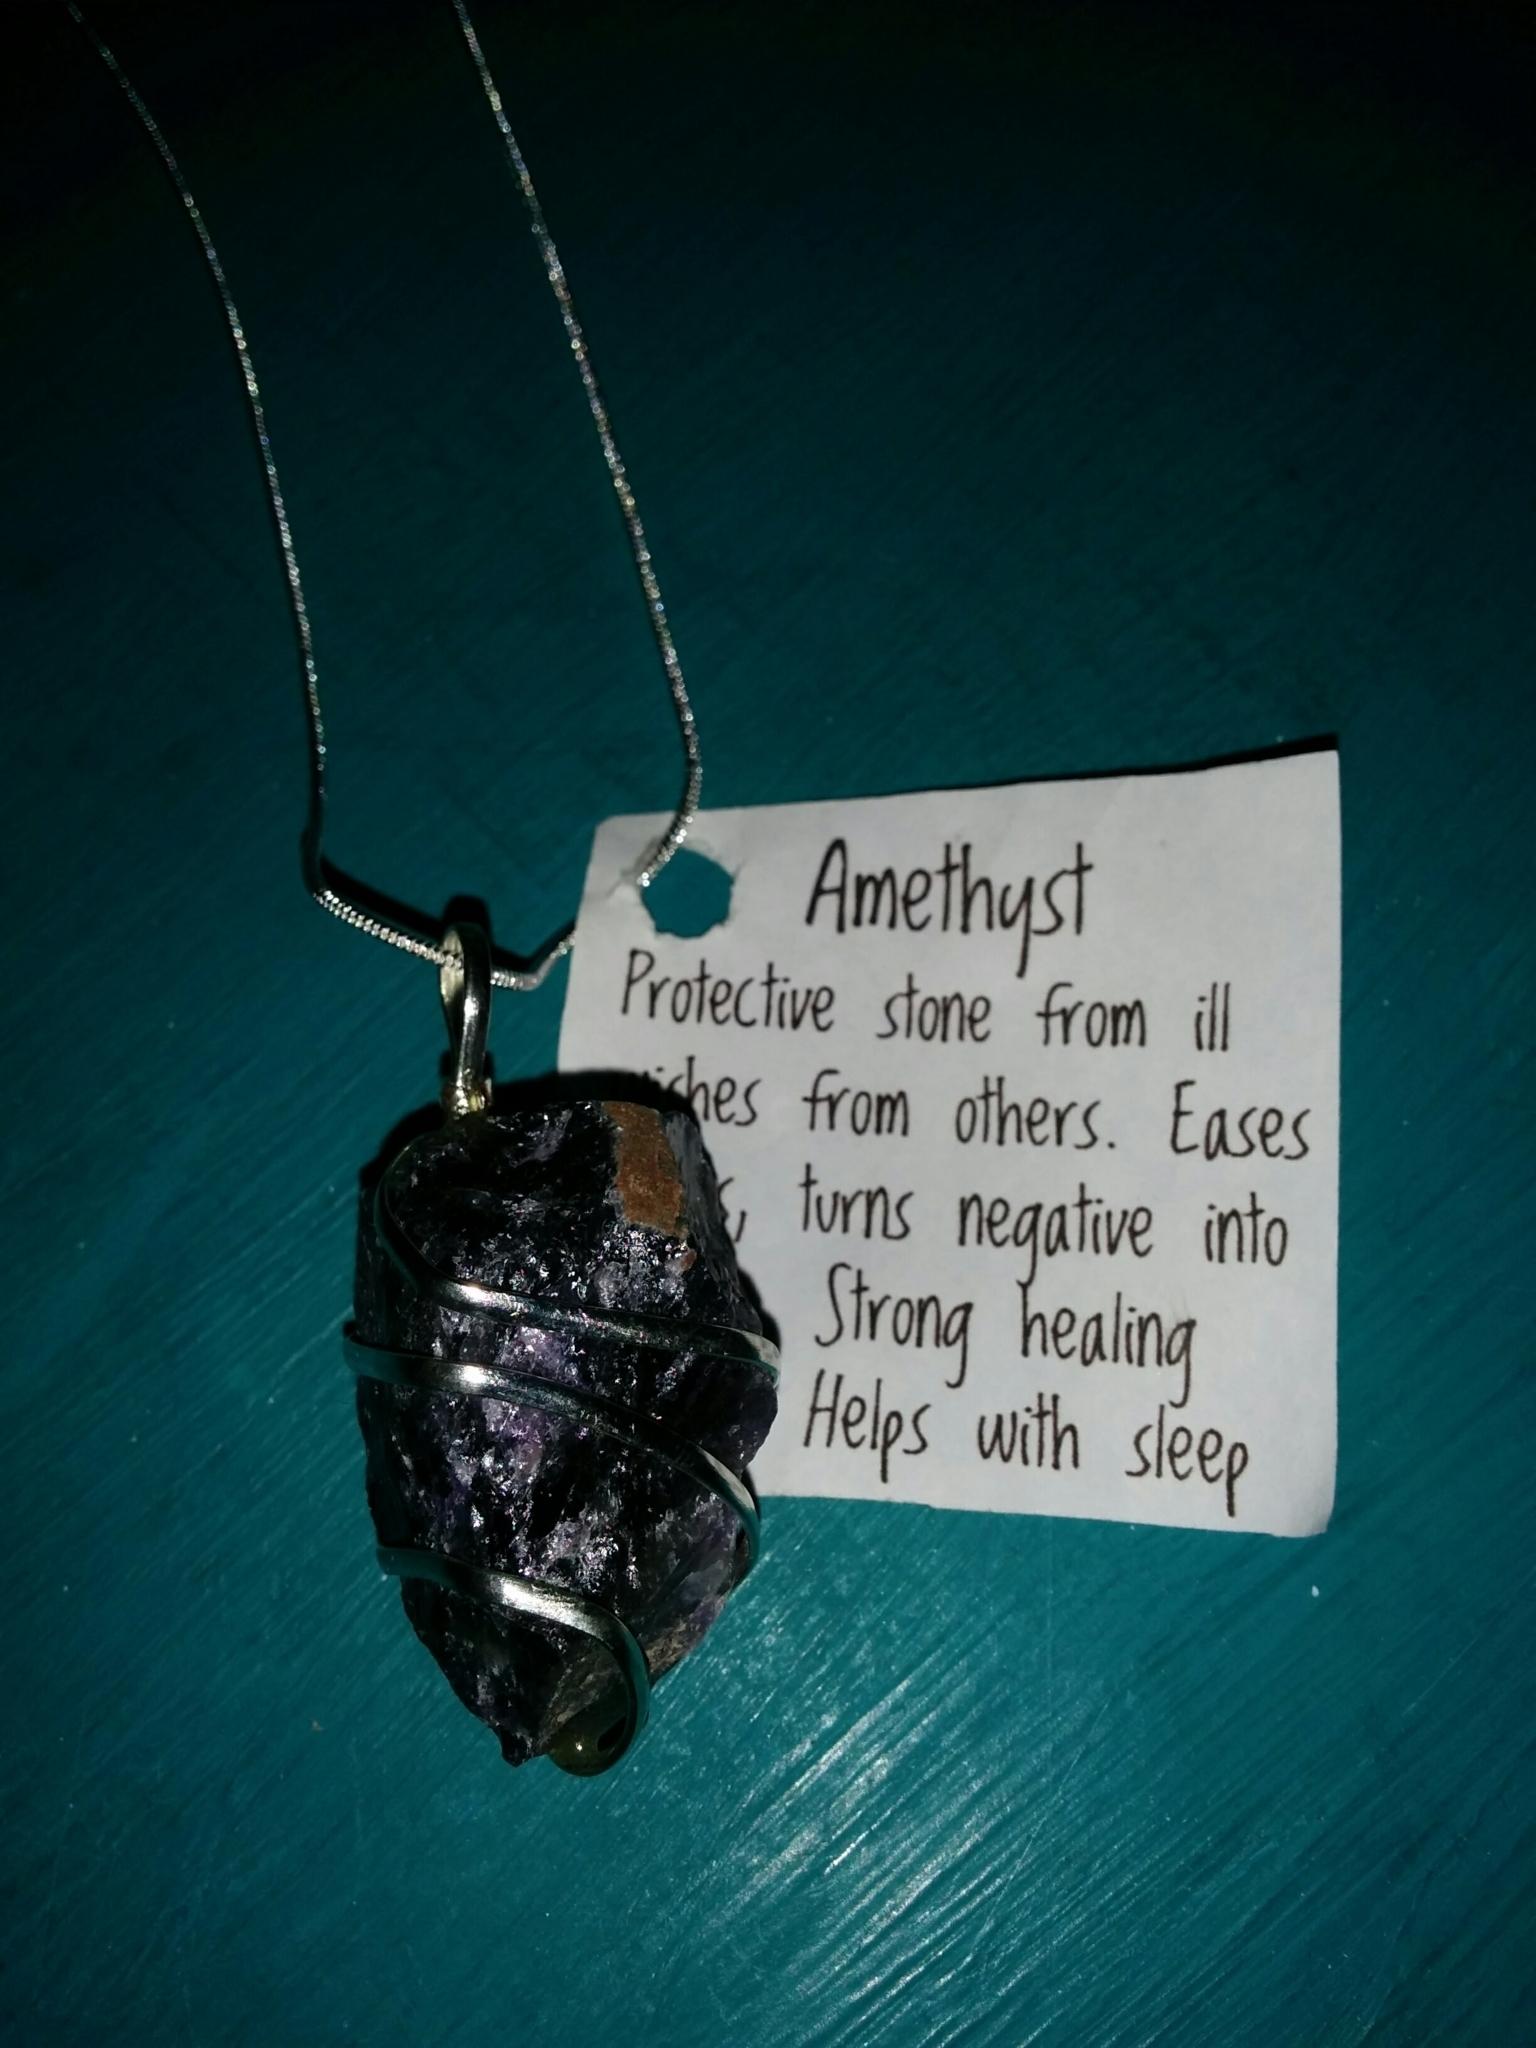 Brassy Lassy Inc in St John's: Amethyst (healing) wire wrapped pendant on sterling chain, $20